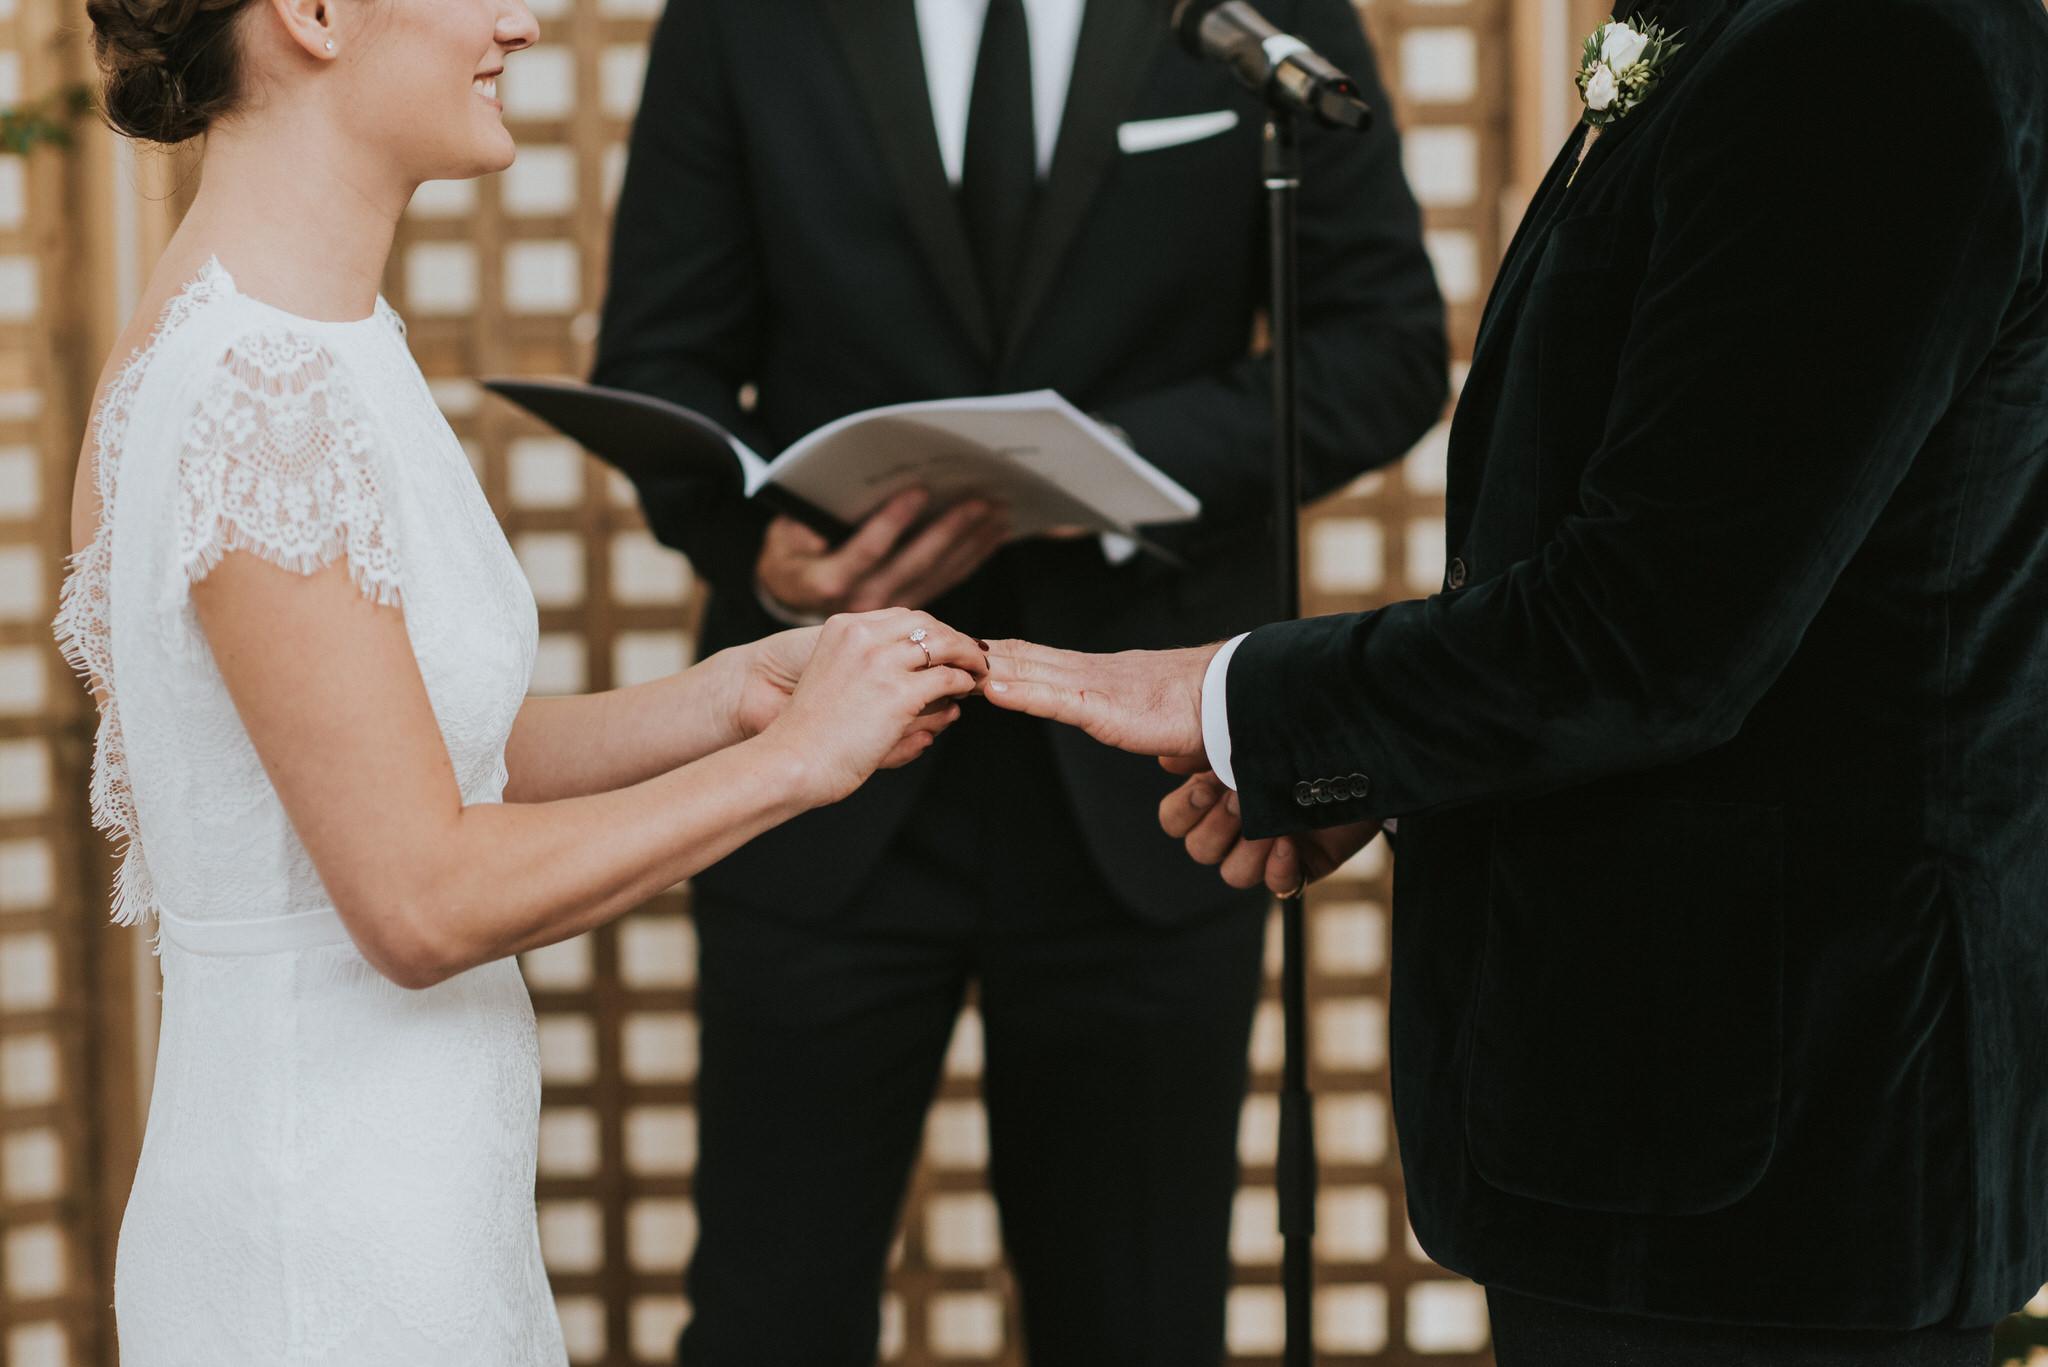 scarletoneillphotography_weddingphotography_prince edward county weddings118.JPG